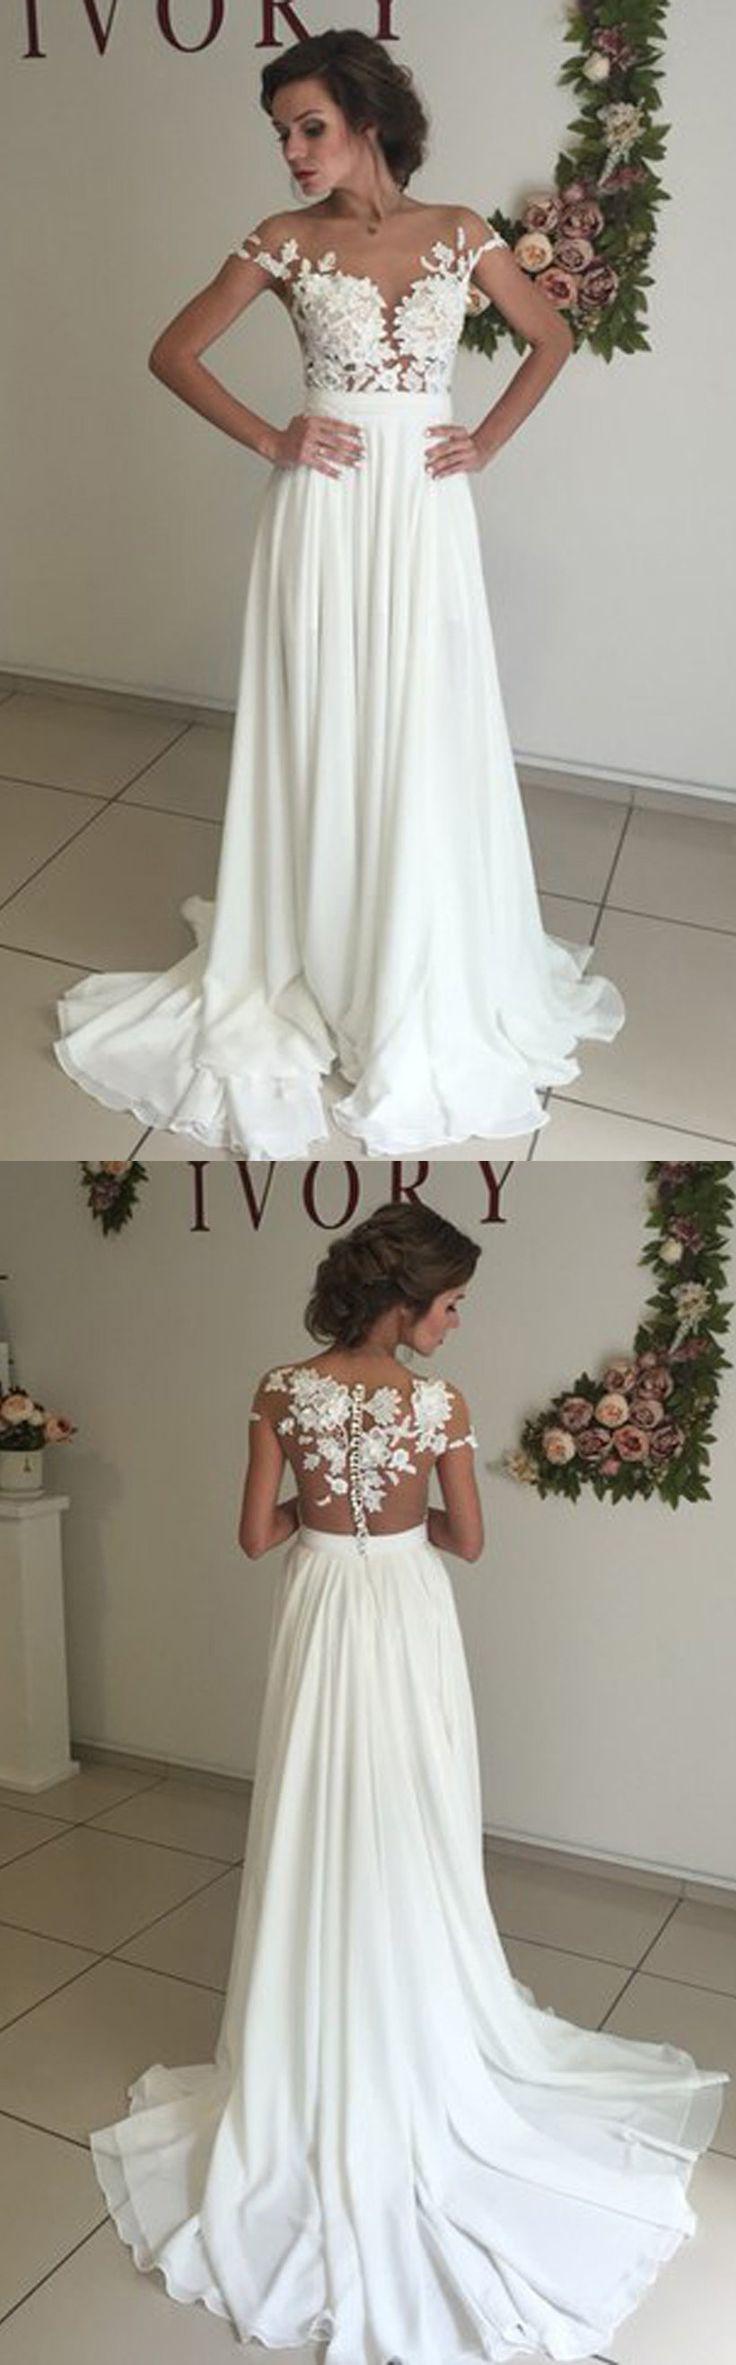 White dress chiffon - Best 25 White Chiffon Dresses Ideas On Pinterest White Chiffon Beautiful White Dresses And White Dress Accessories